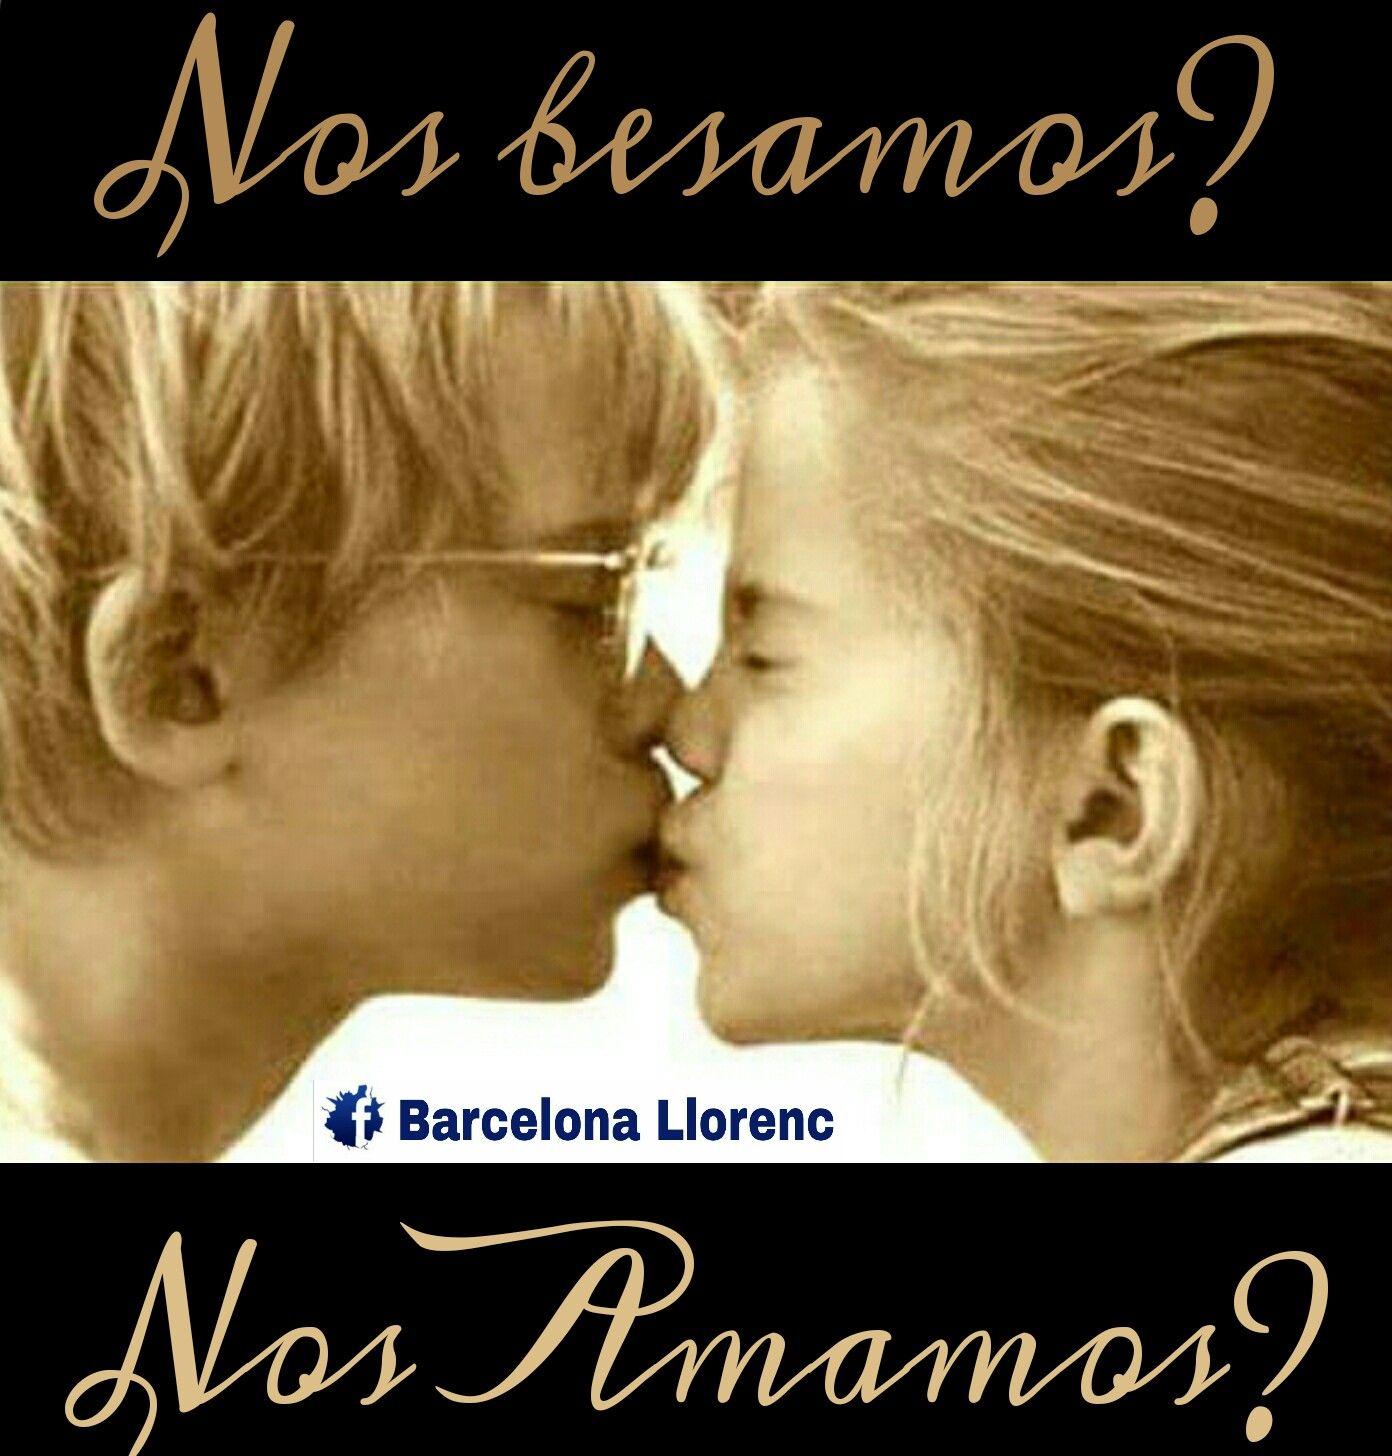 Buscame, llamame,  Bésame! ♡❤️♡  MESSENGER: m.me/Lorenzitosabadell